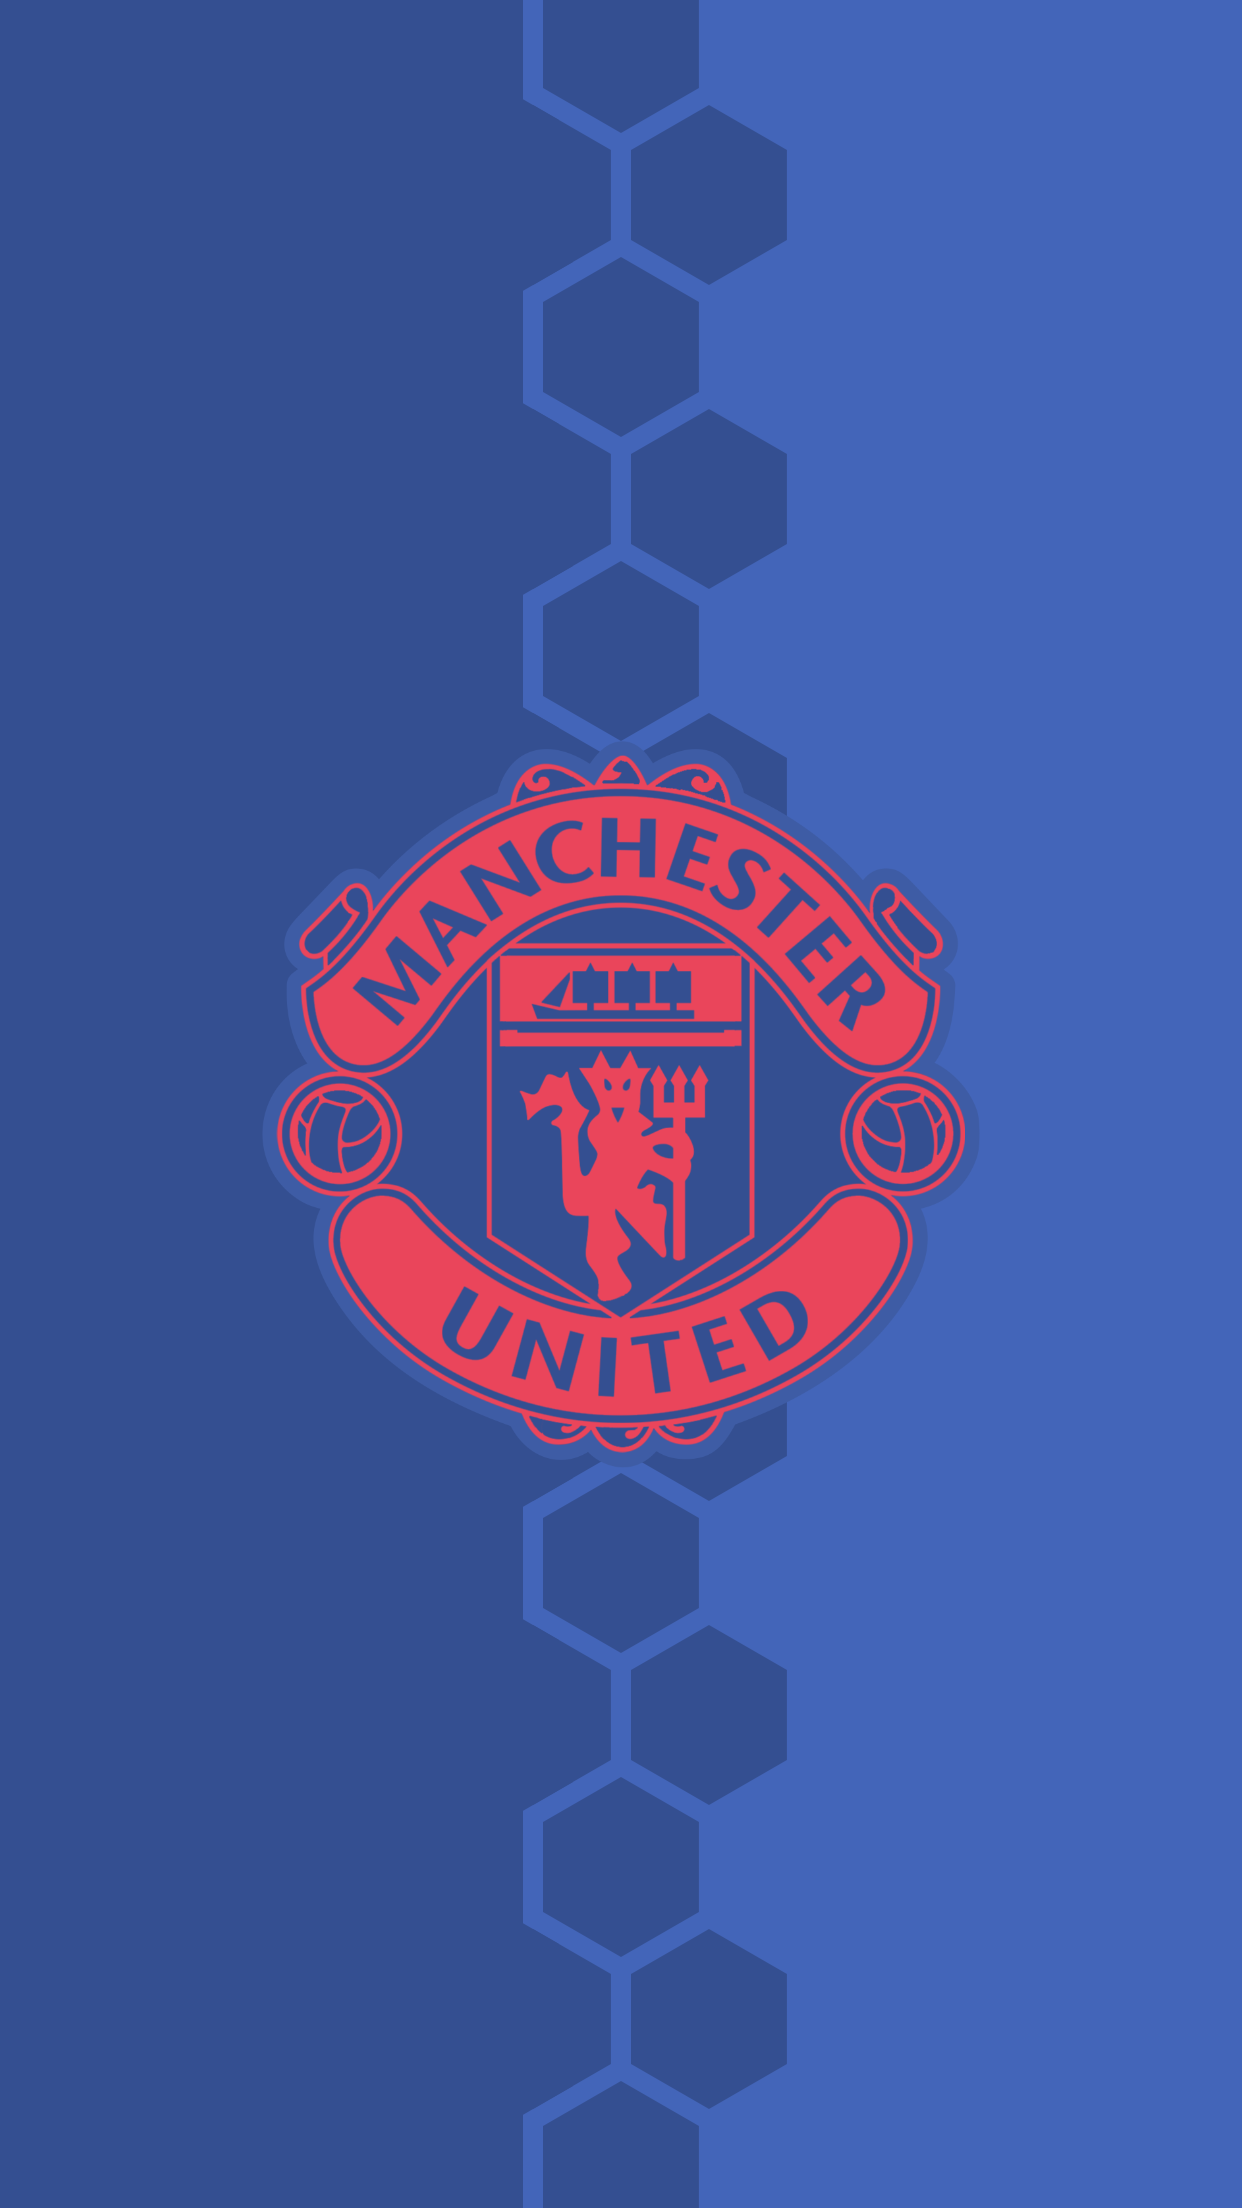 Pin Oleh Krishna Di Manchester United Sepak Bola Olahraga Gambar